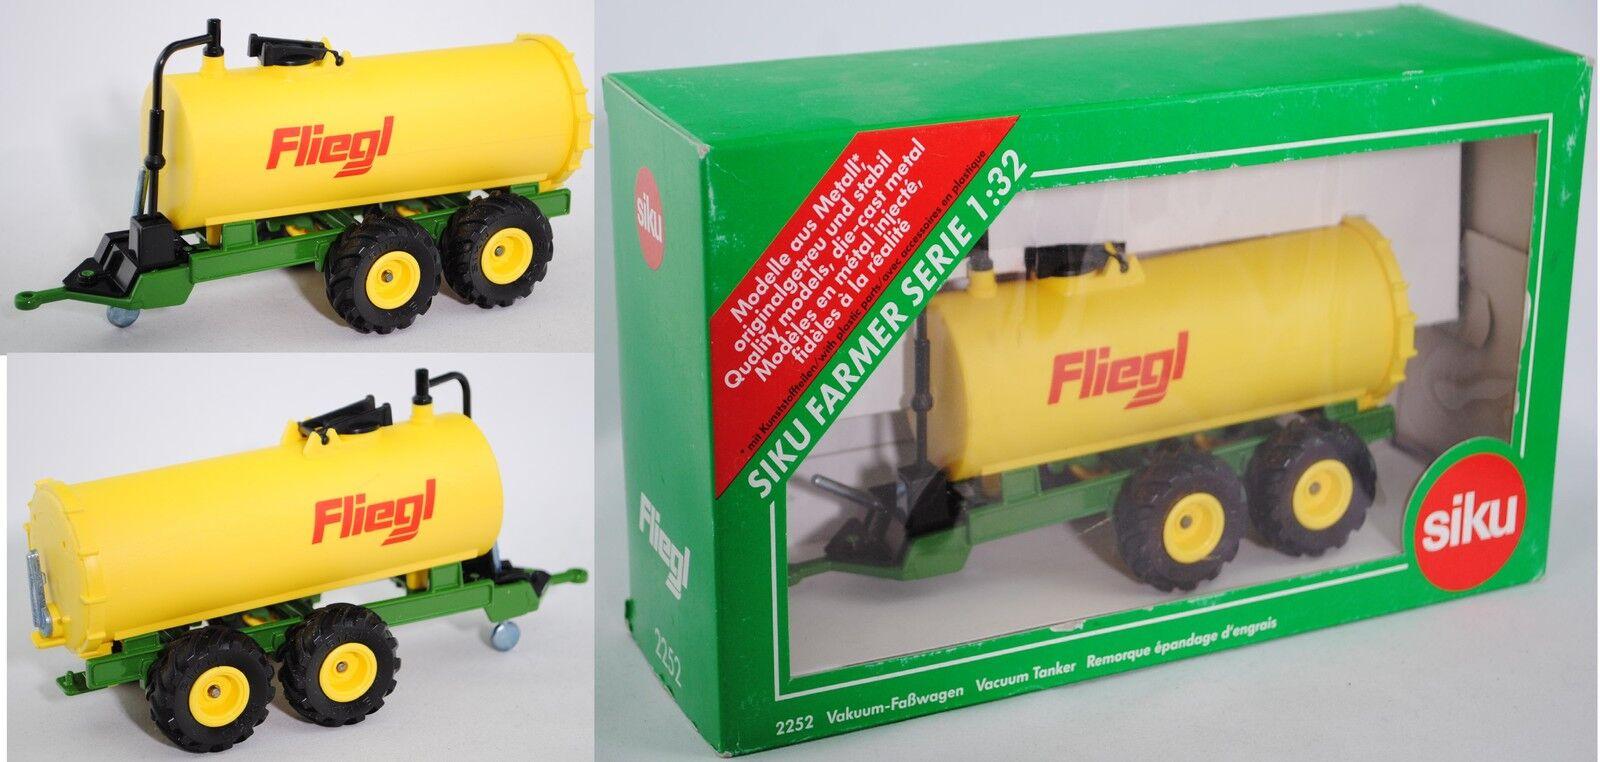 SIKU FARMER 2252 vide-Faßwagen, Zinkjaune vert prairie, Guyot 1 32 publicitaires boîte